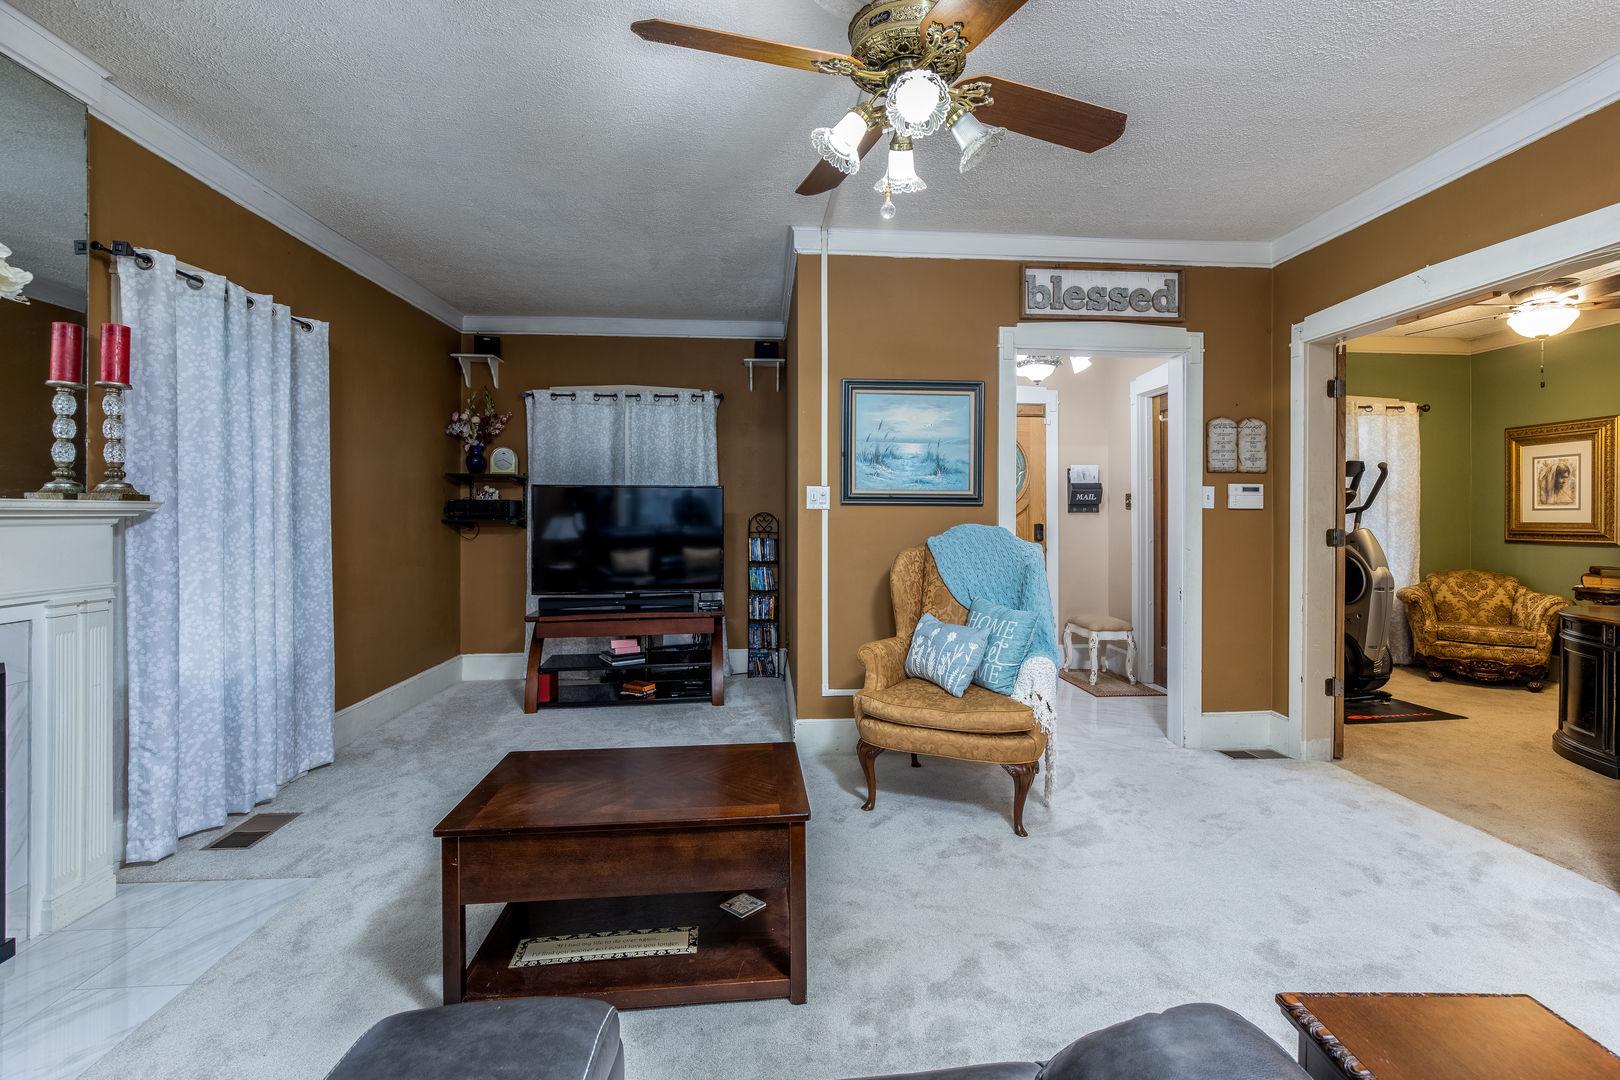 320 West Stanton, Streator, Illinois, 61364